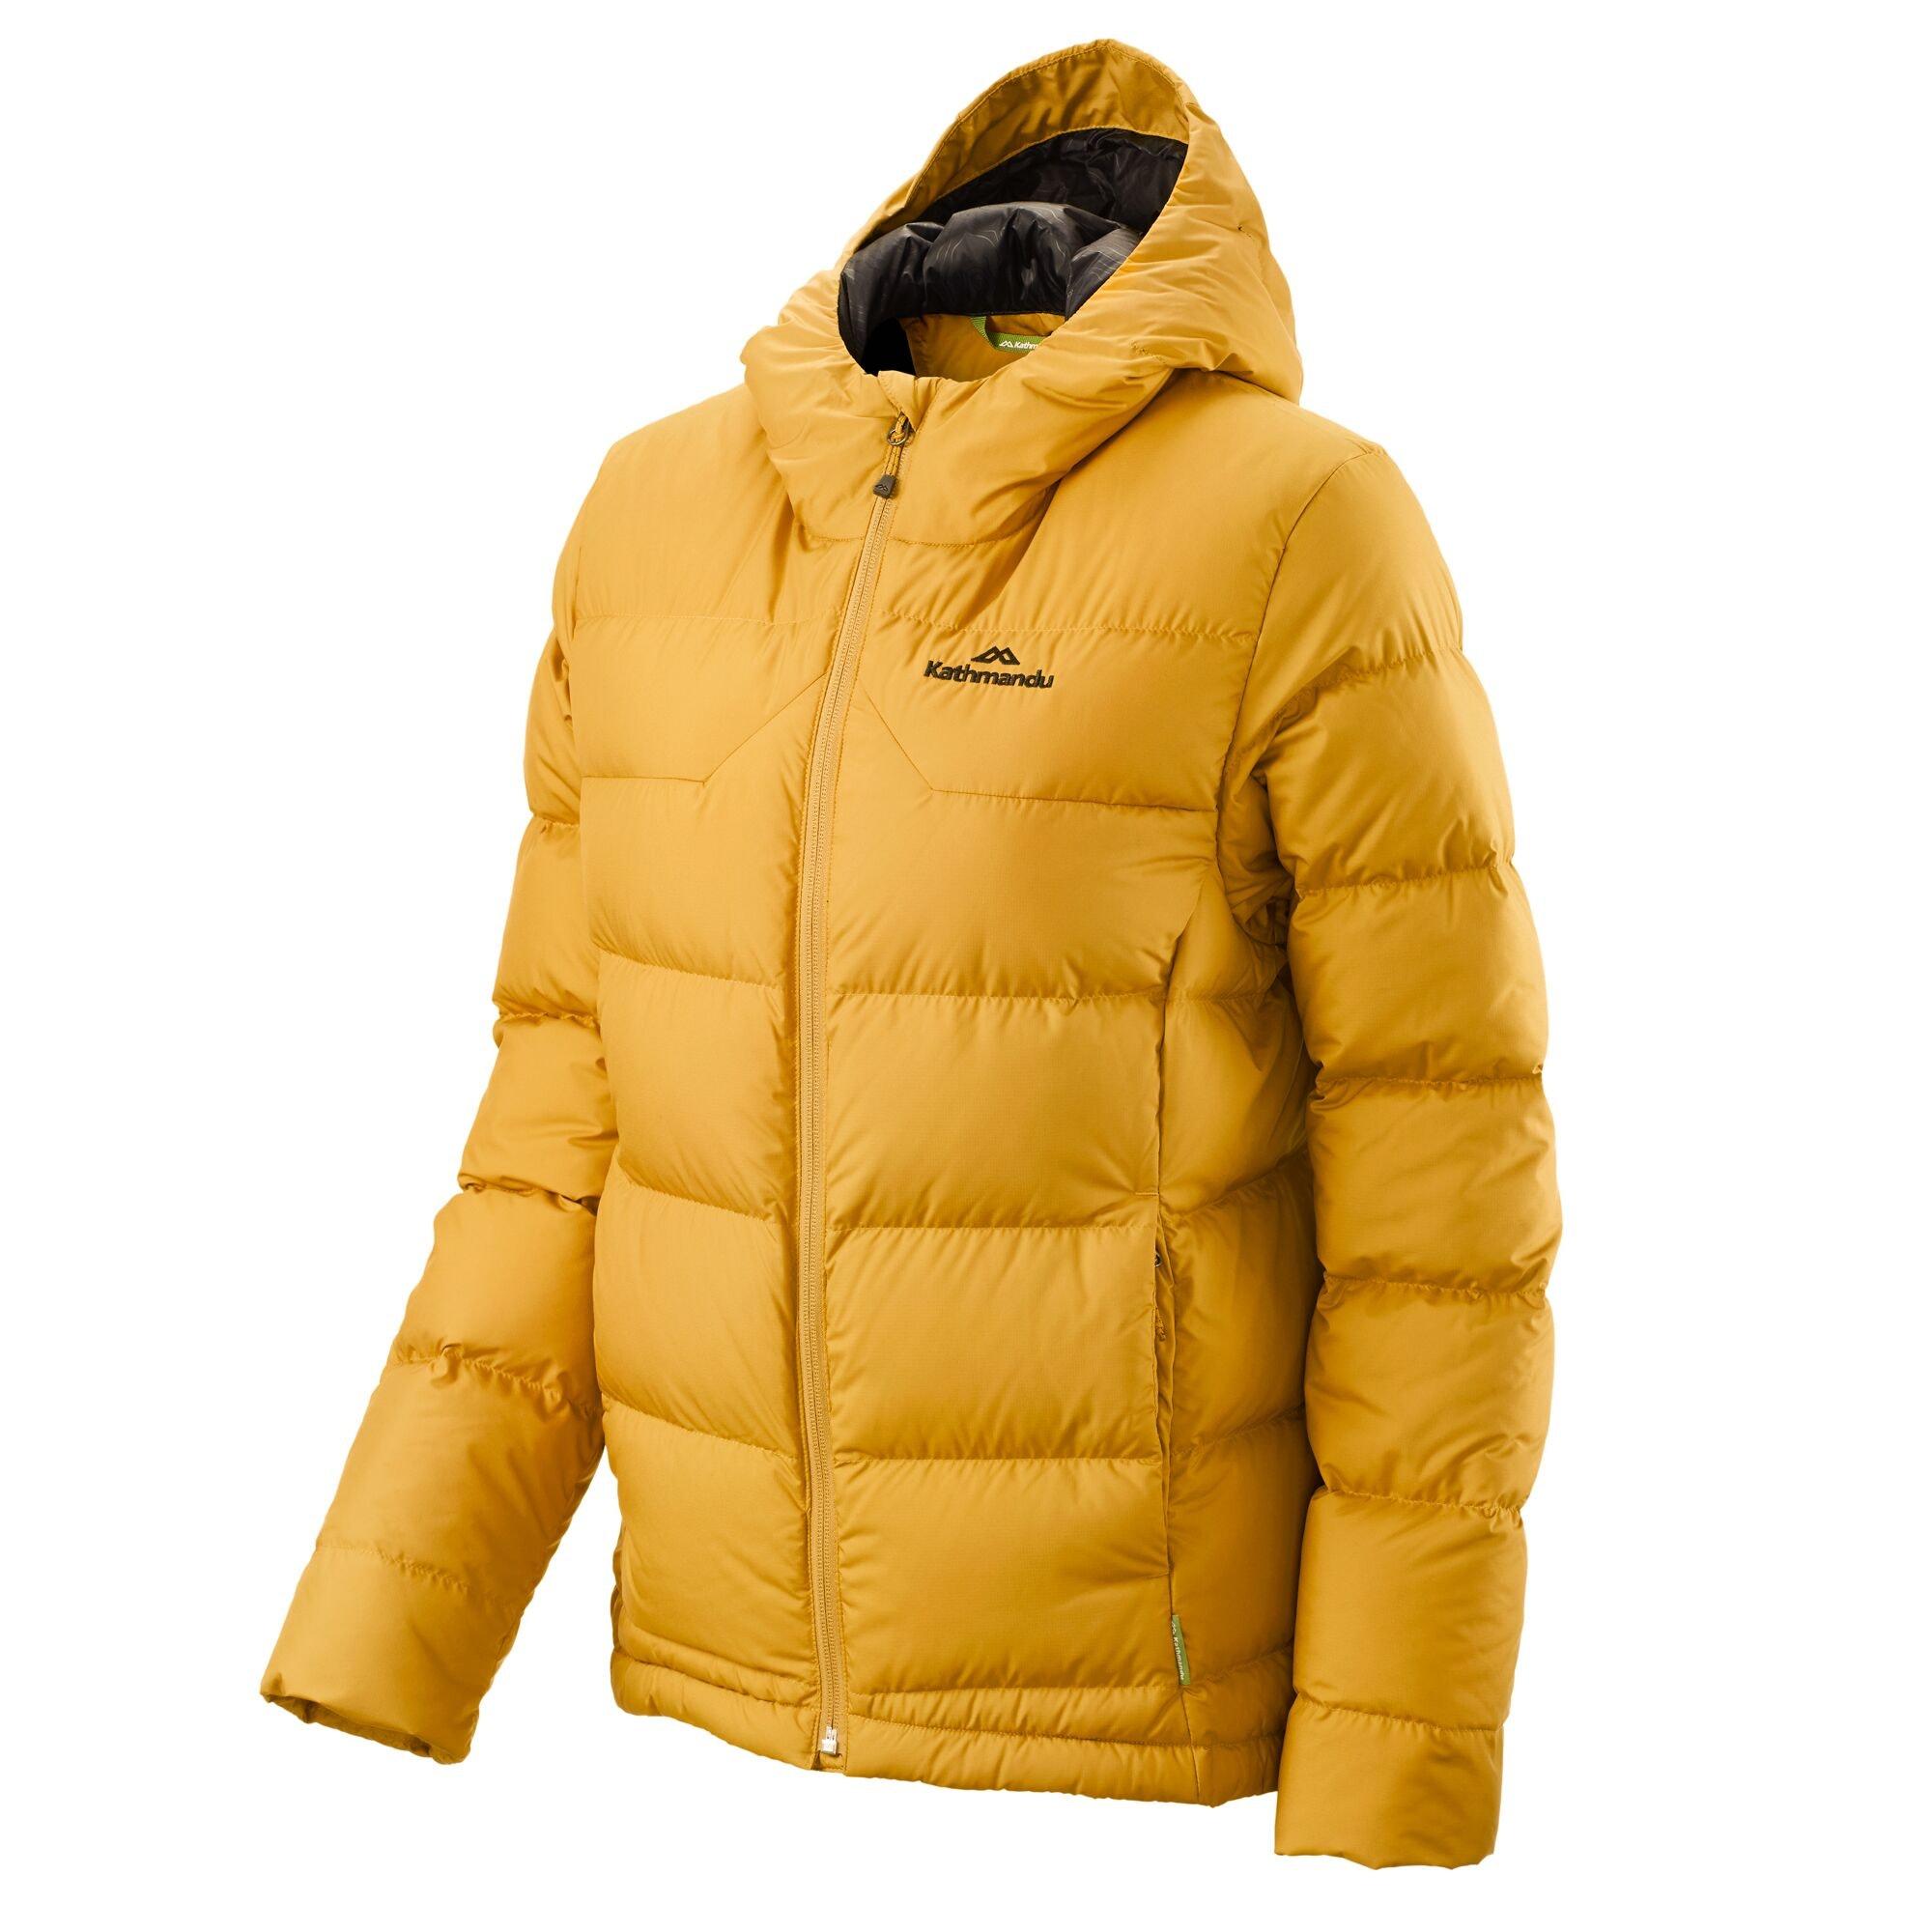 thumbnail 50 - NEW Kathmandu Epiq Womens Hooded Down Puffer 600 Fill Warm Outdoor Winter Jacket